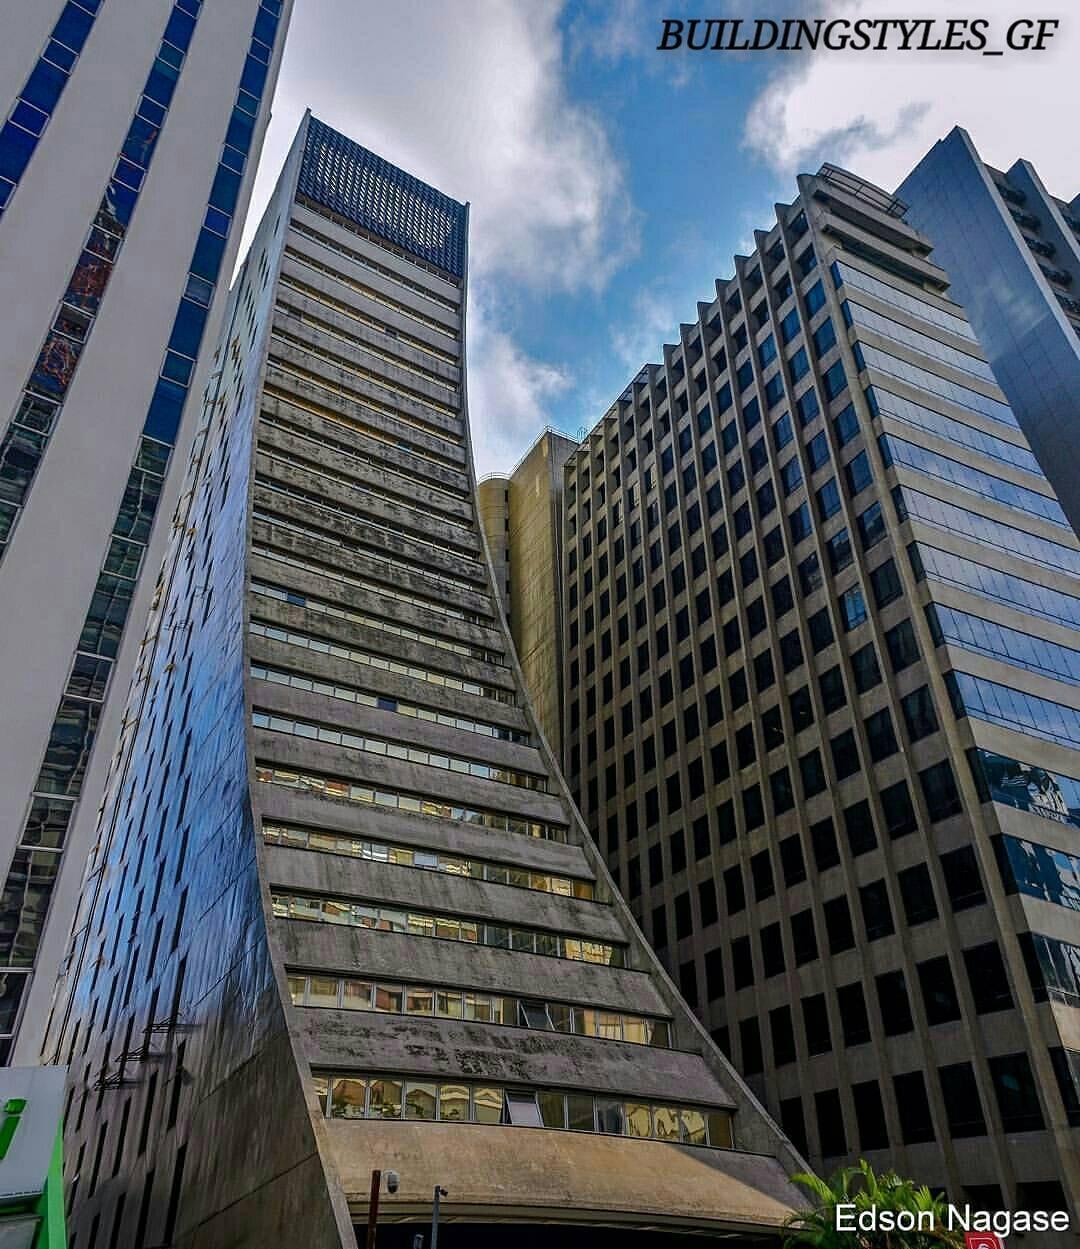 imagenes-de-edificios-modernos1210